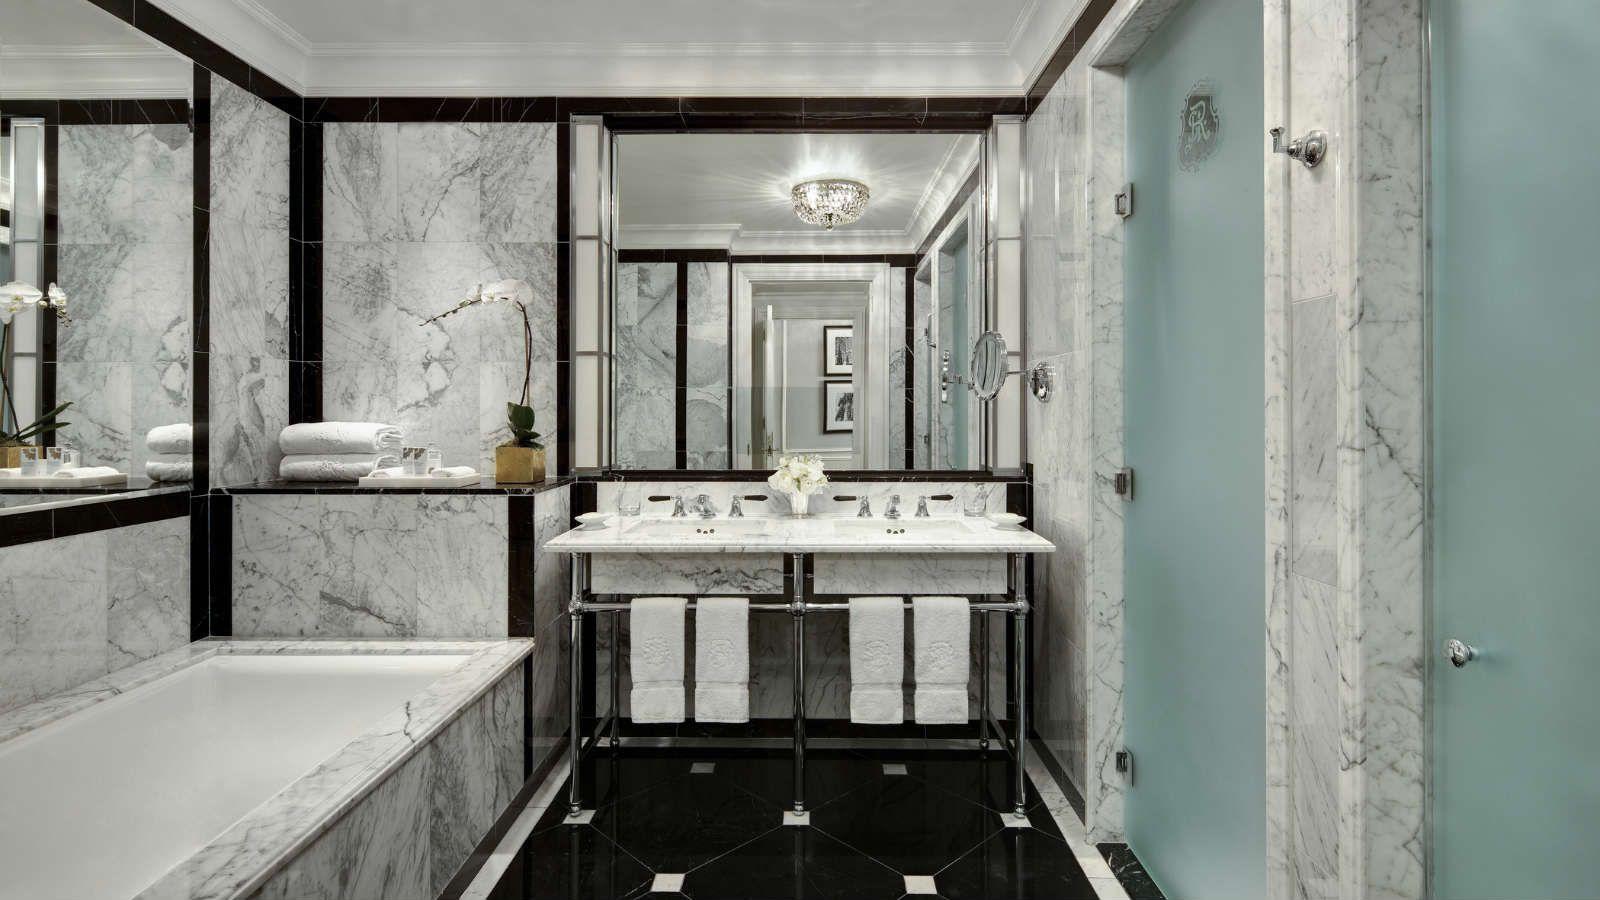 The St Regis New York Guest Room Bathroom Bathroom Nyc Hotels